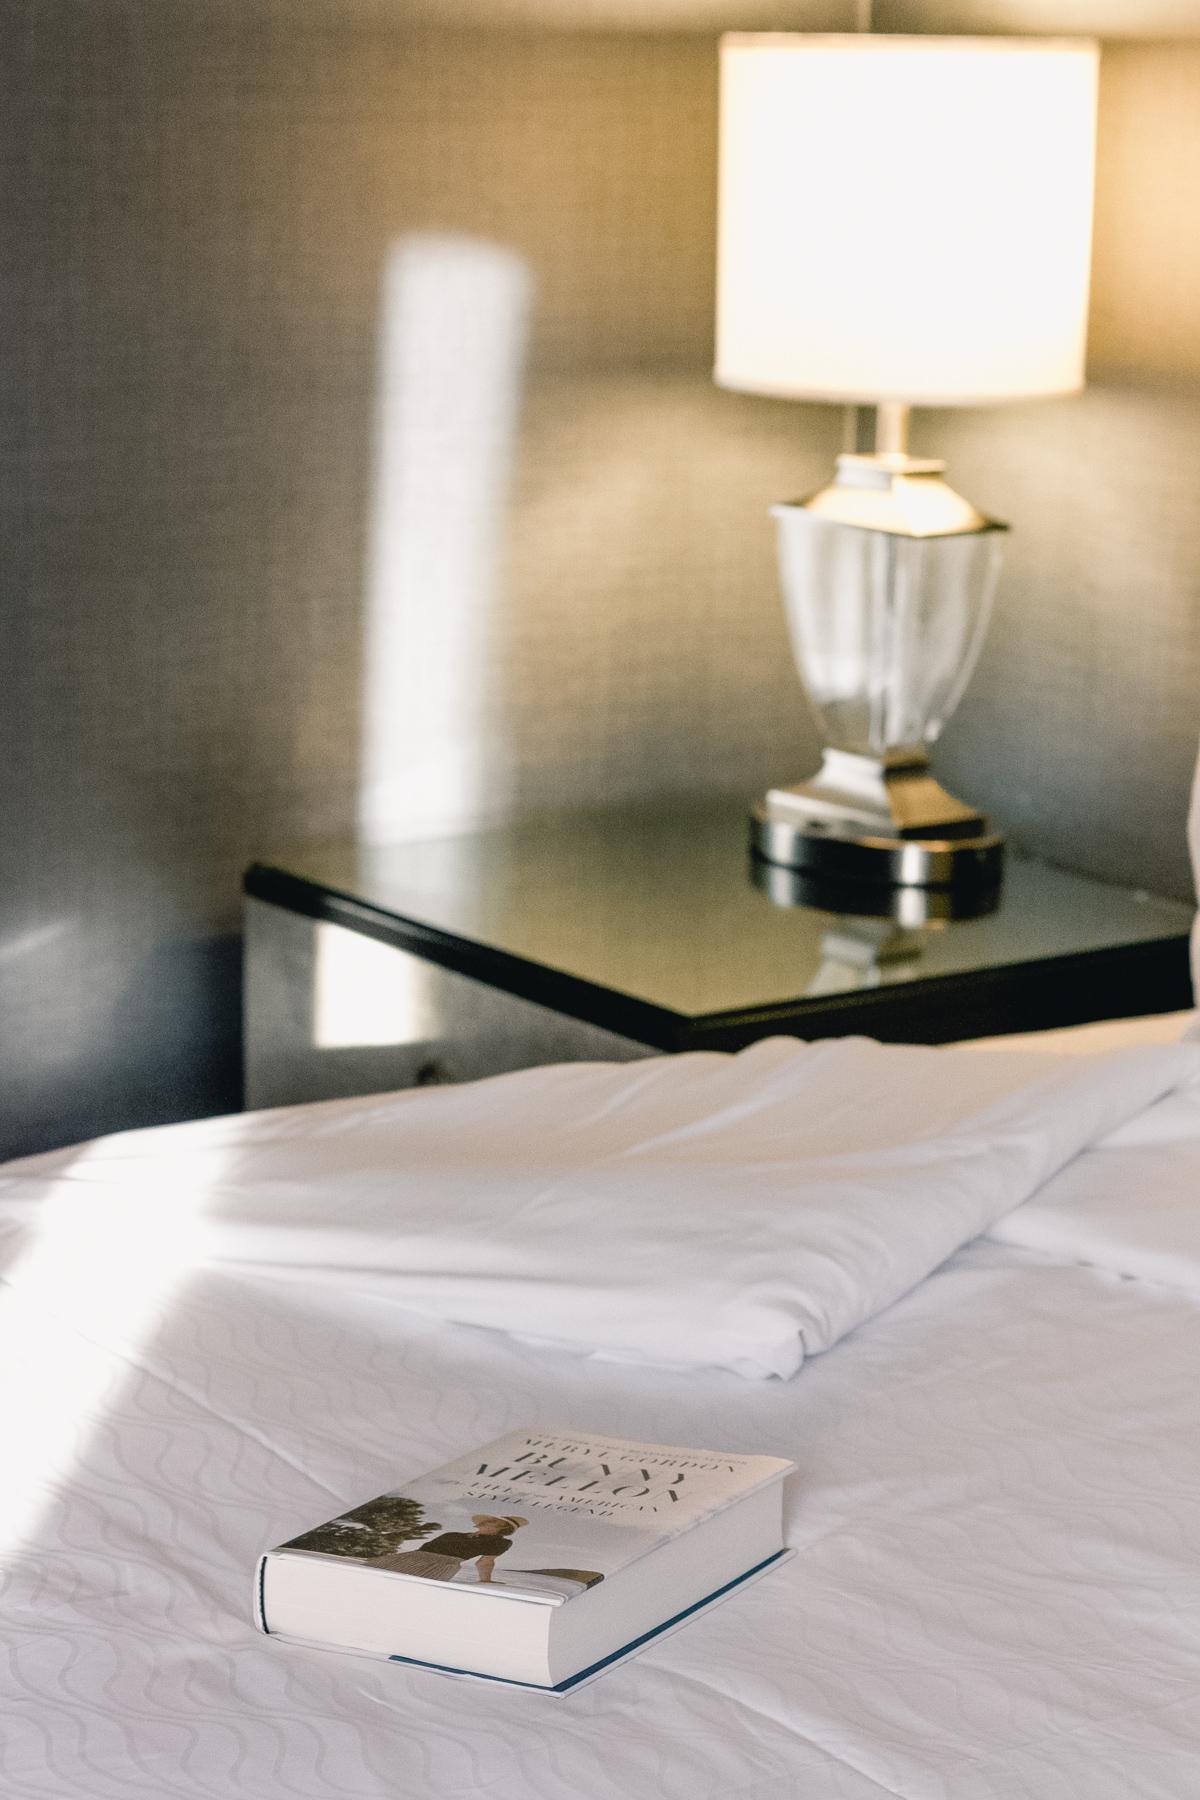 Melrose Hotel, Georgetown, DC